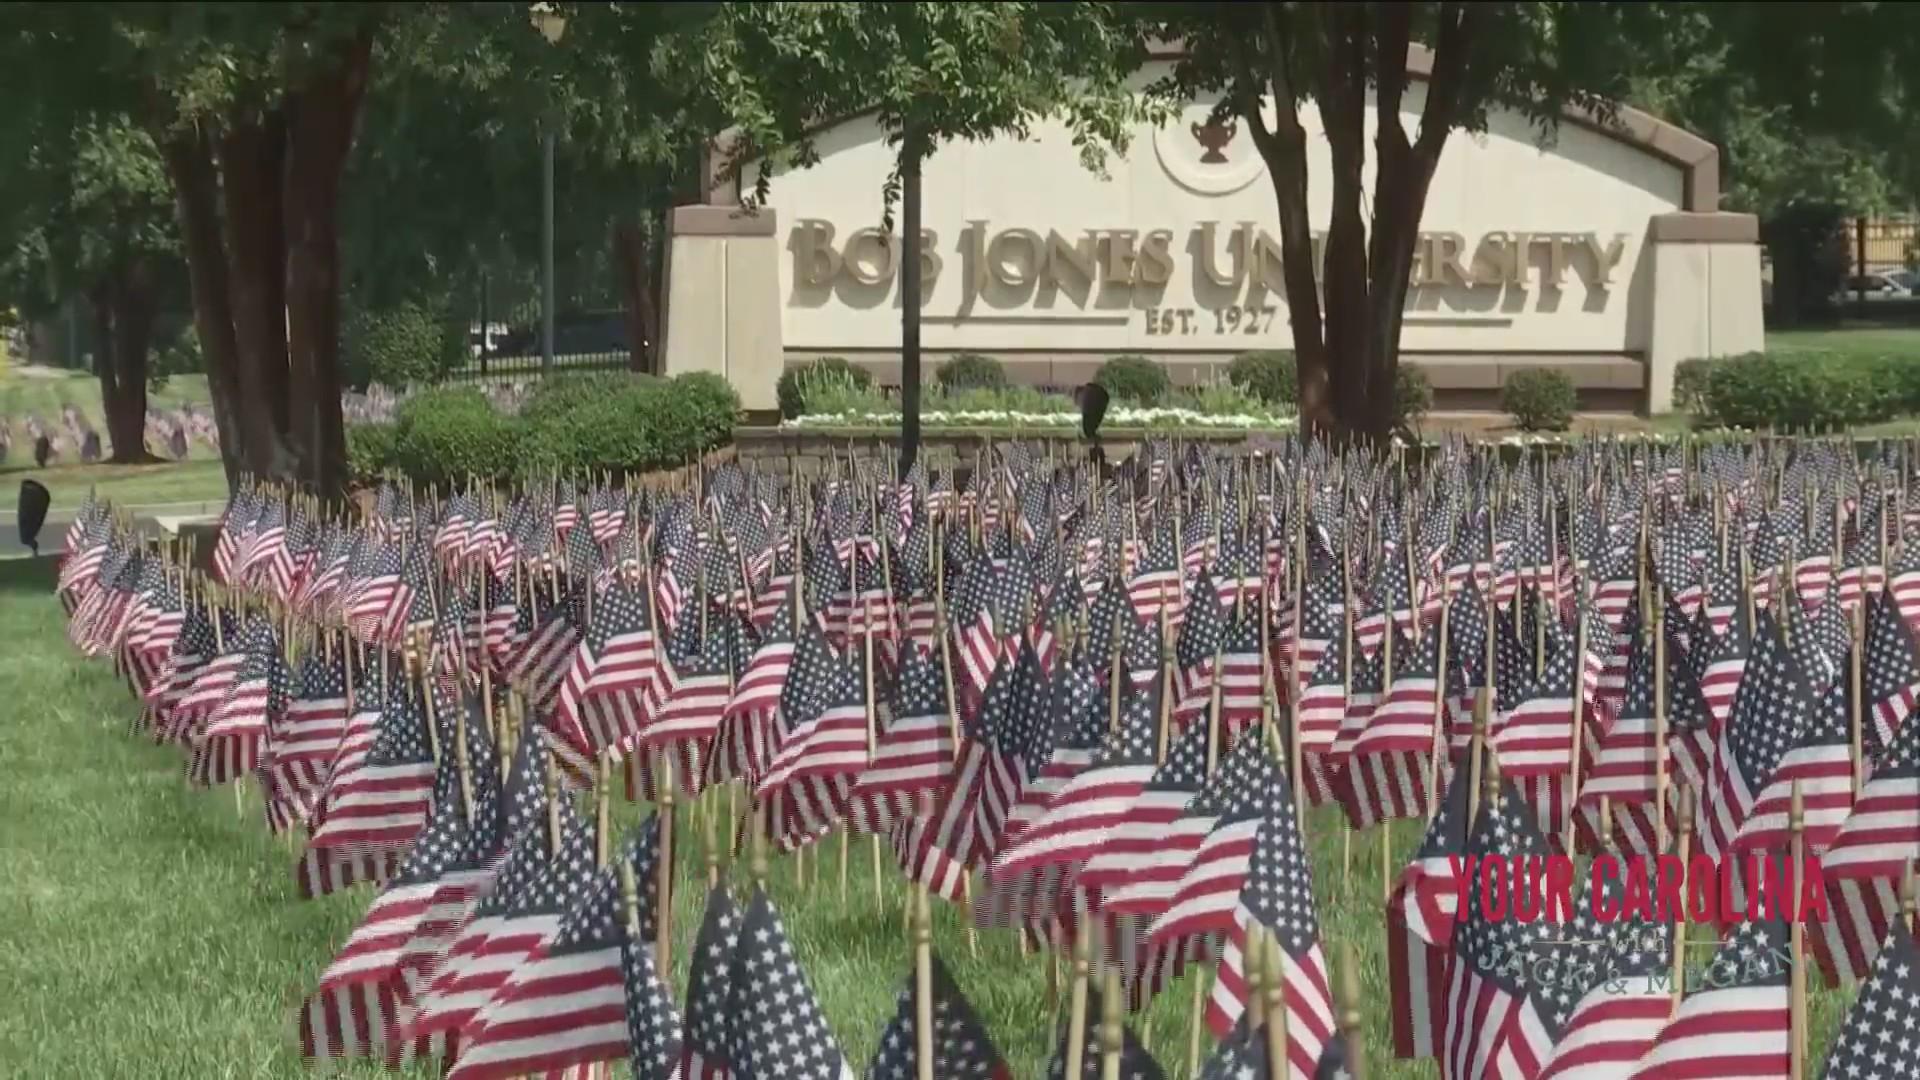 9/11 Flag Display at Bob Jones University